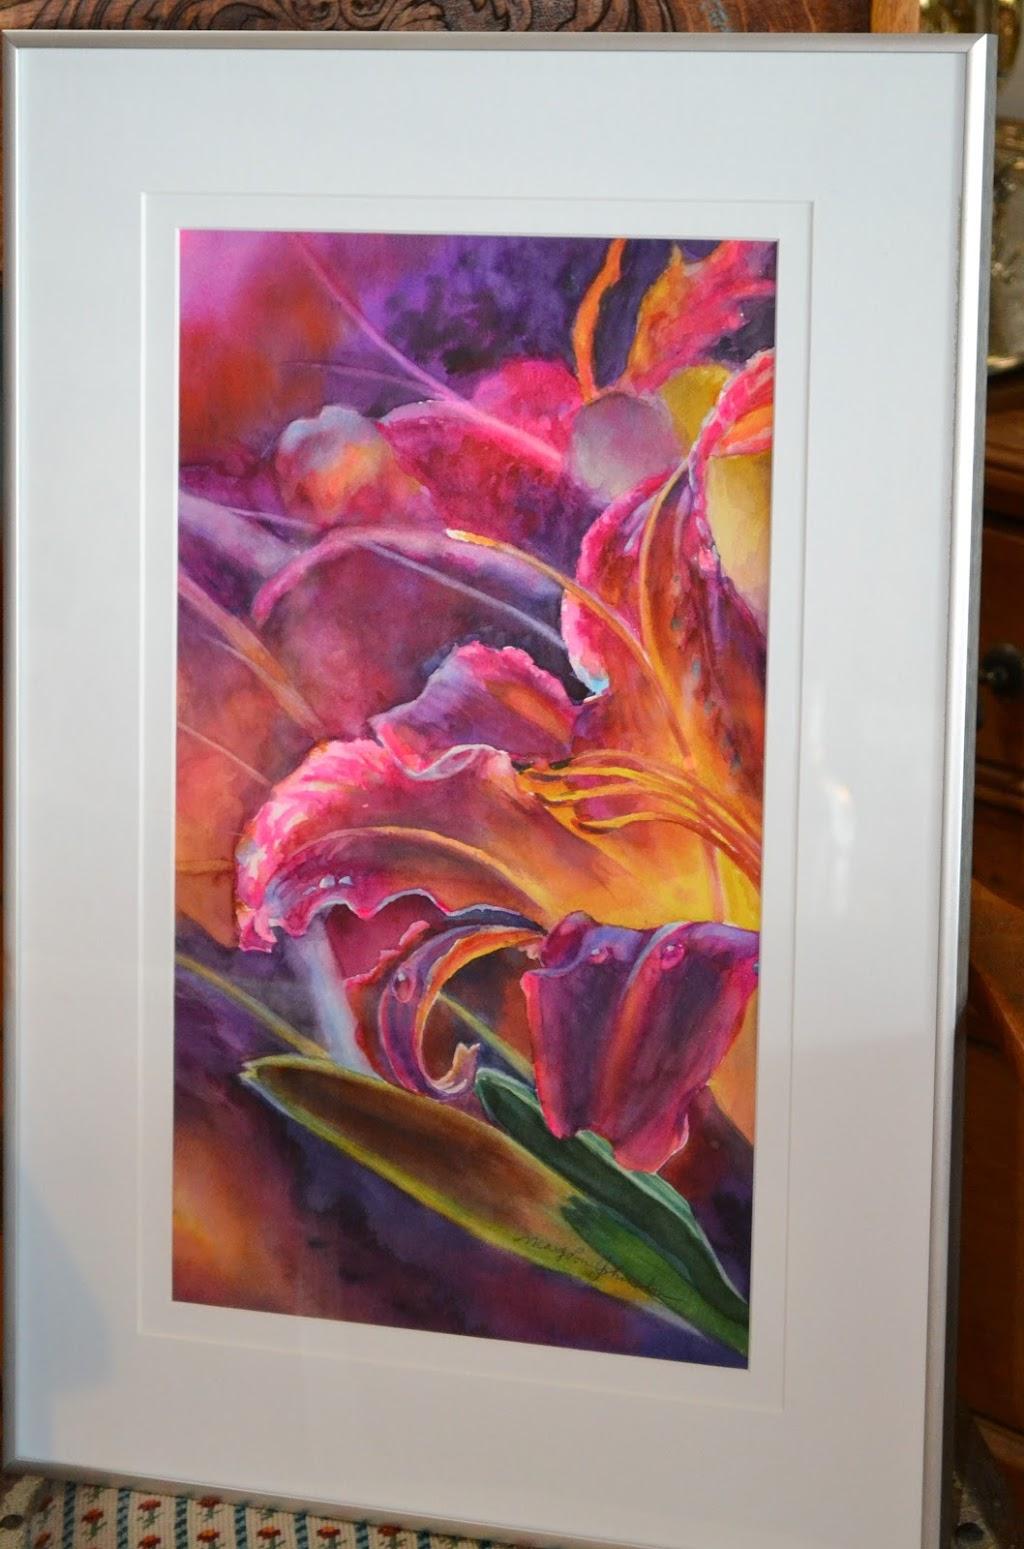 Framed-In Tyme | art gallery | 122 Merritt St, Ingersoll, ON N5C 3A1, Canada | 5193594825 OR +1 519-359-4825